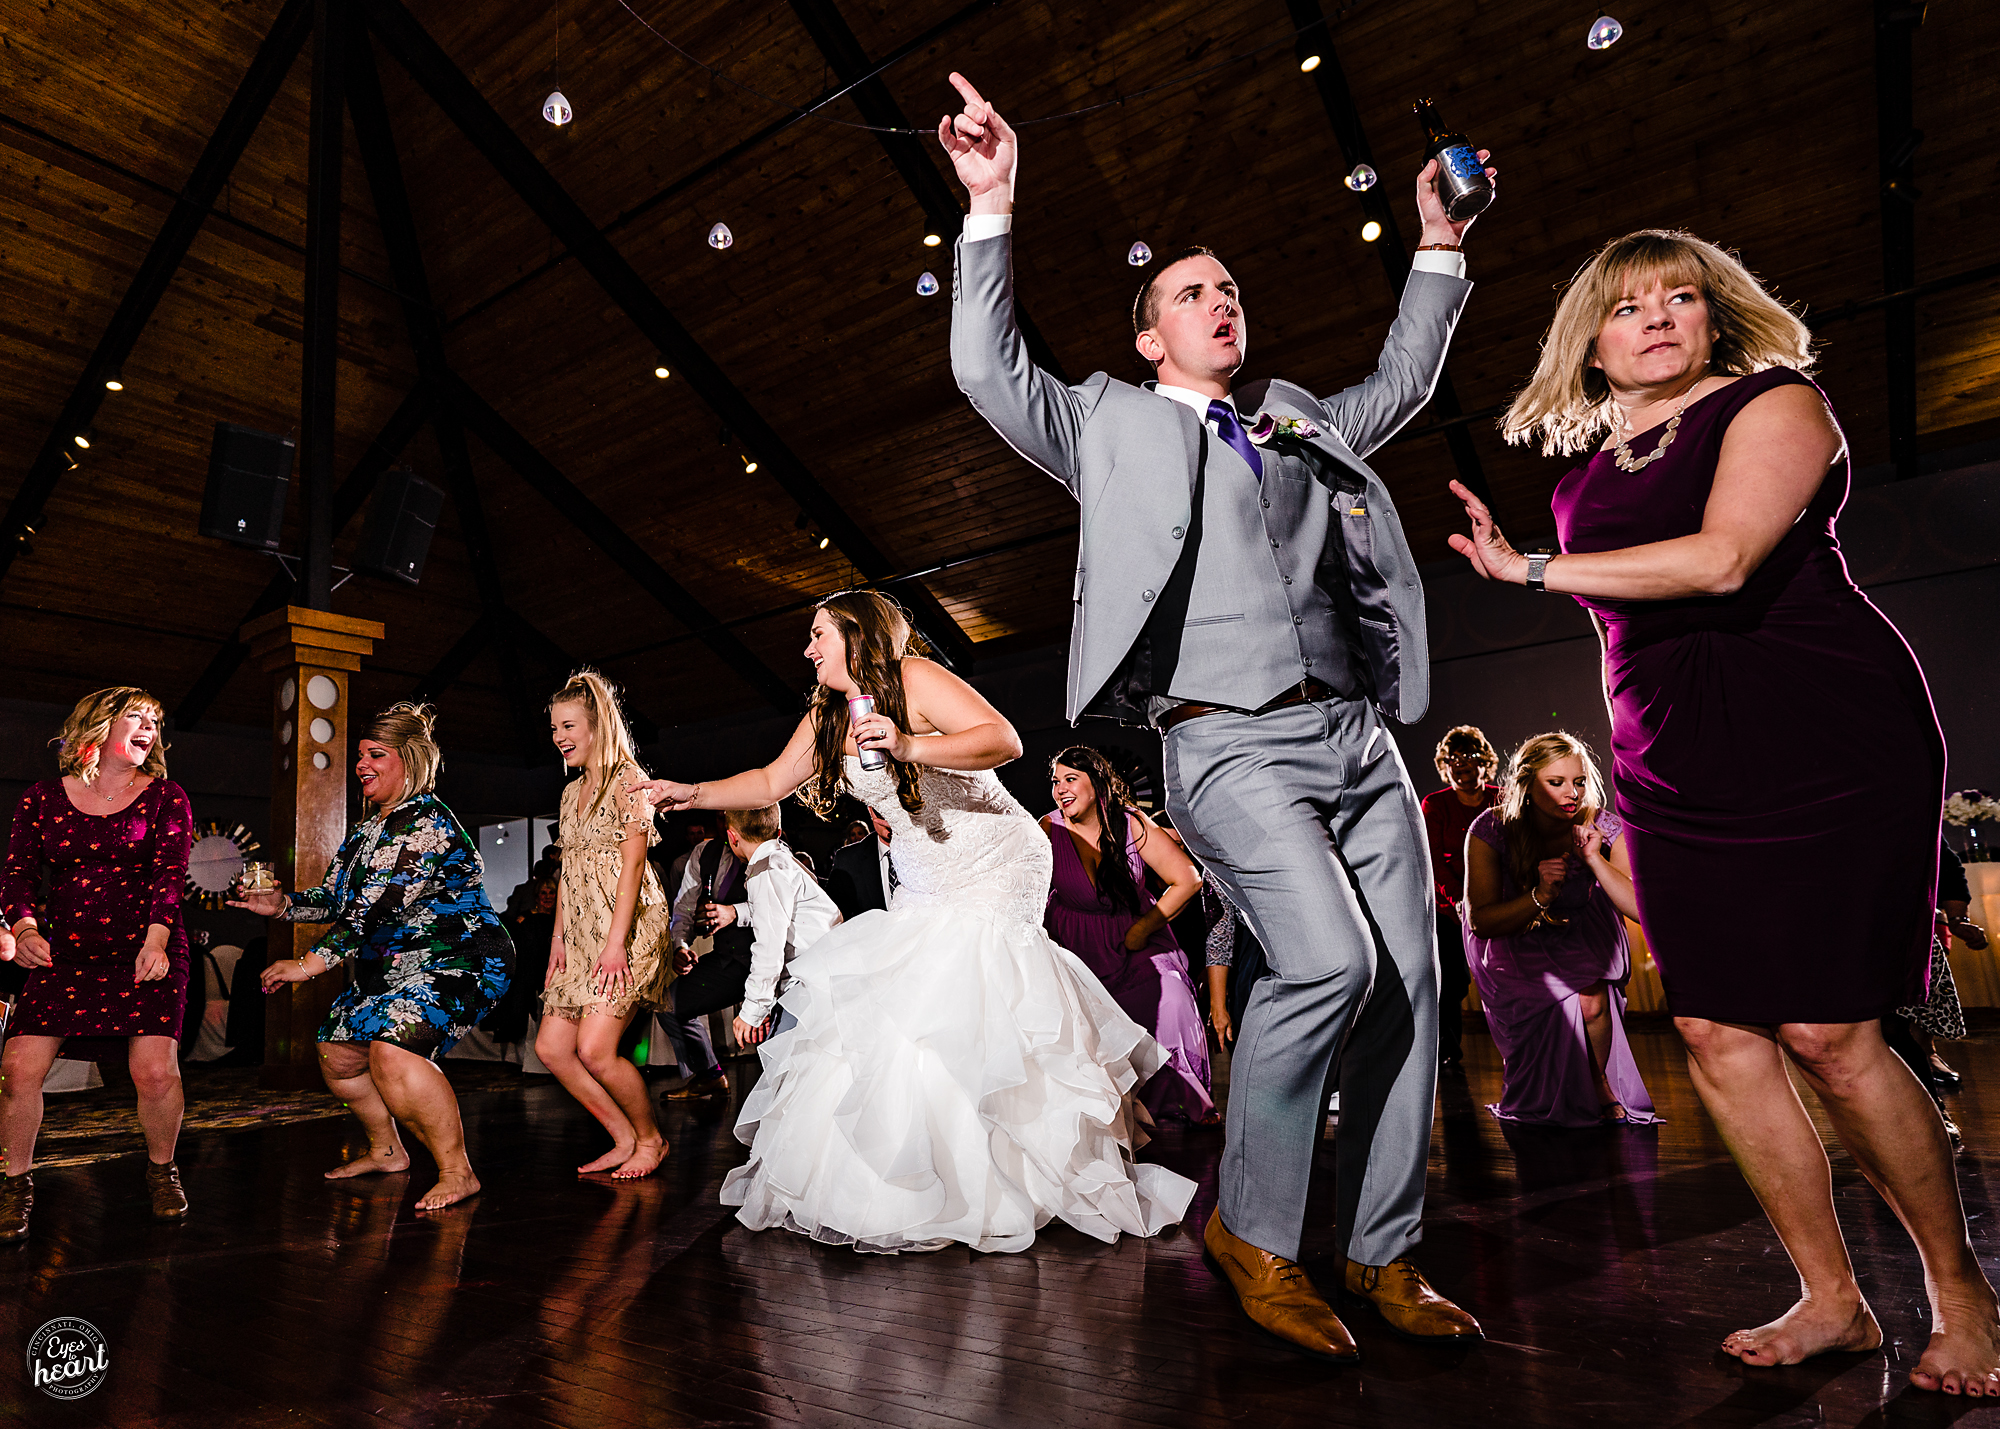 The-Pinnacle-Ballroom-Covington-KY-Wedding-Photography-23.jpg